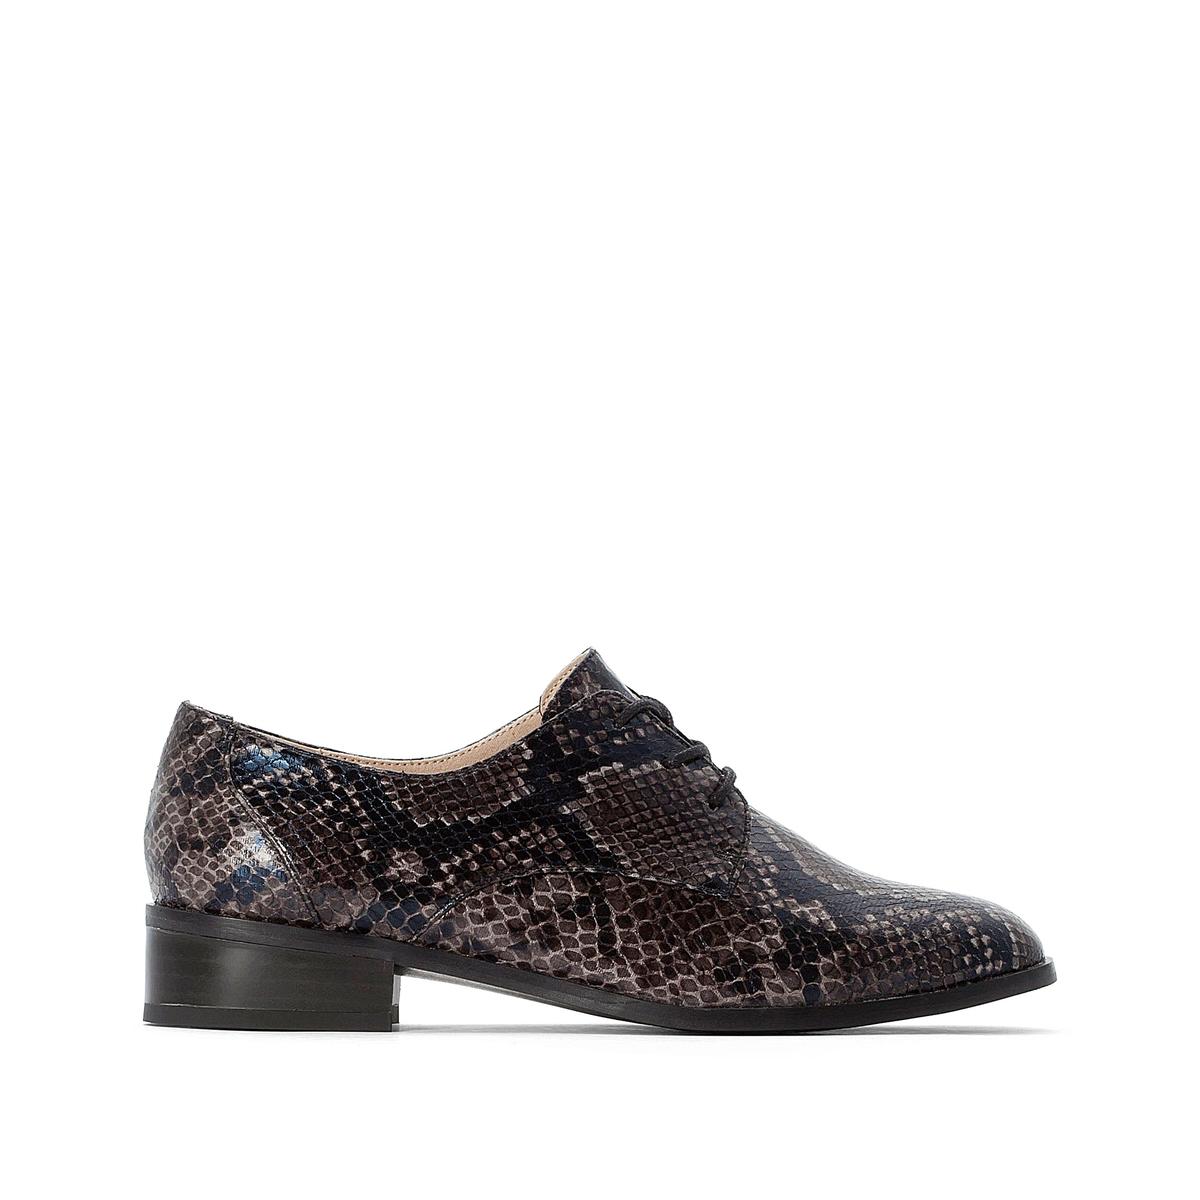 Ботинки-дерби La Redoute На шнуровке имитация кожи питона 37 каштановый